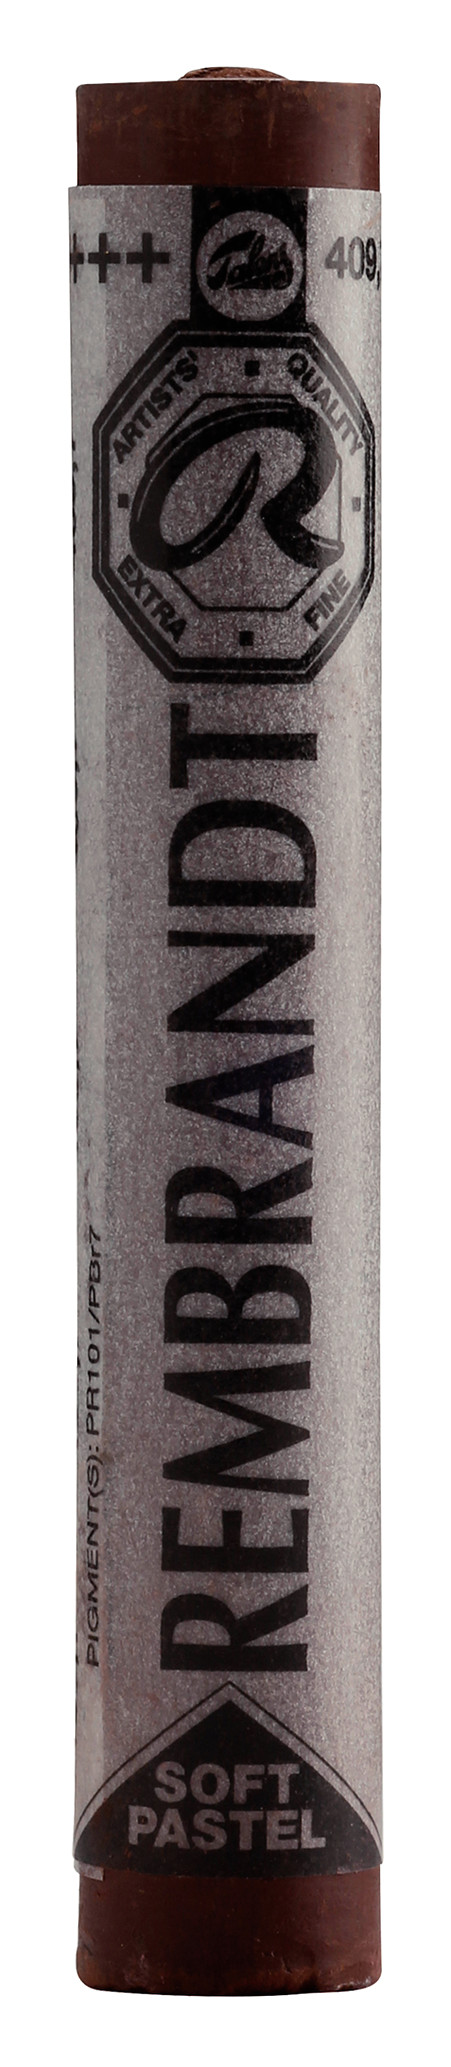 Rembrandt Soft Pastel Round Full Stick Burnt Umber(7) (409.7)